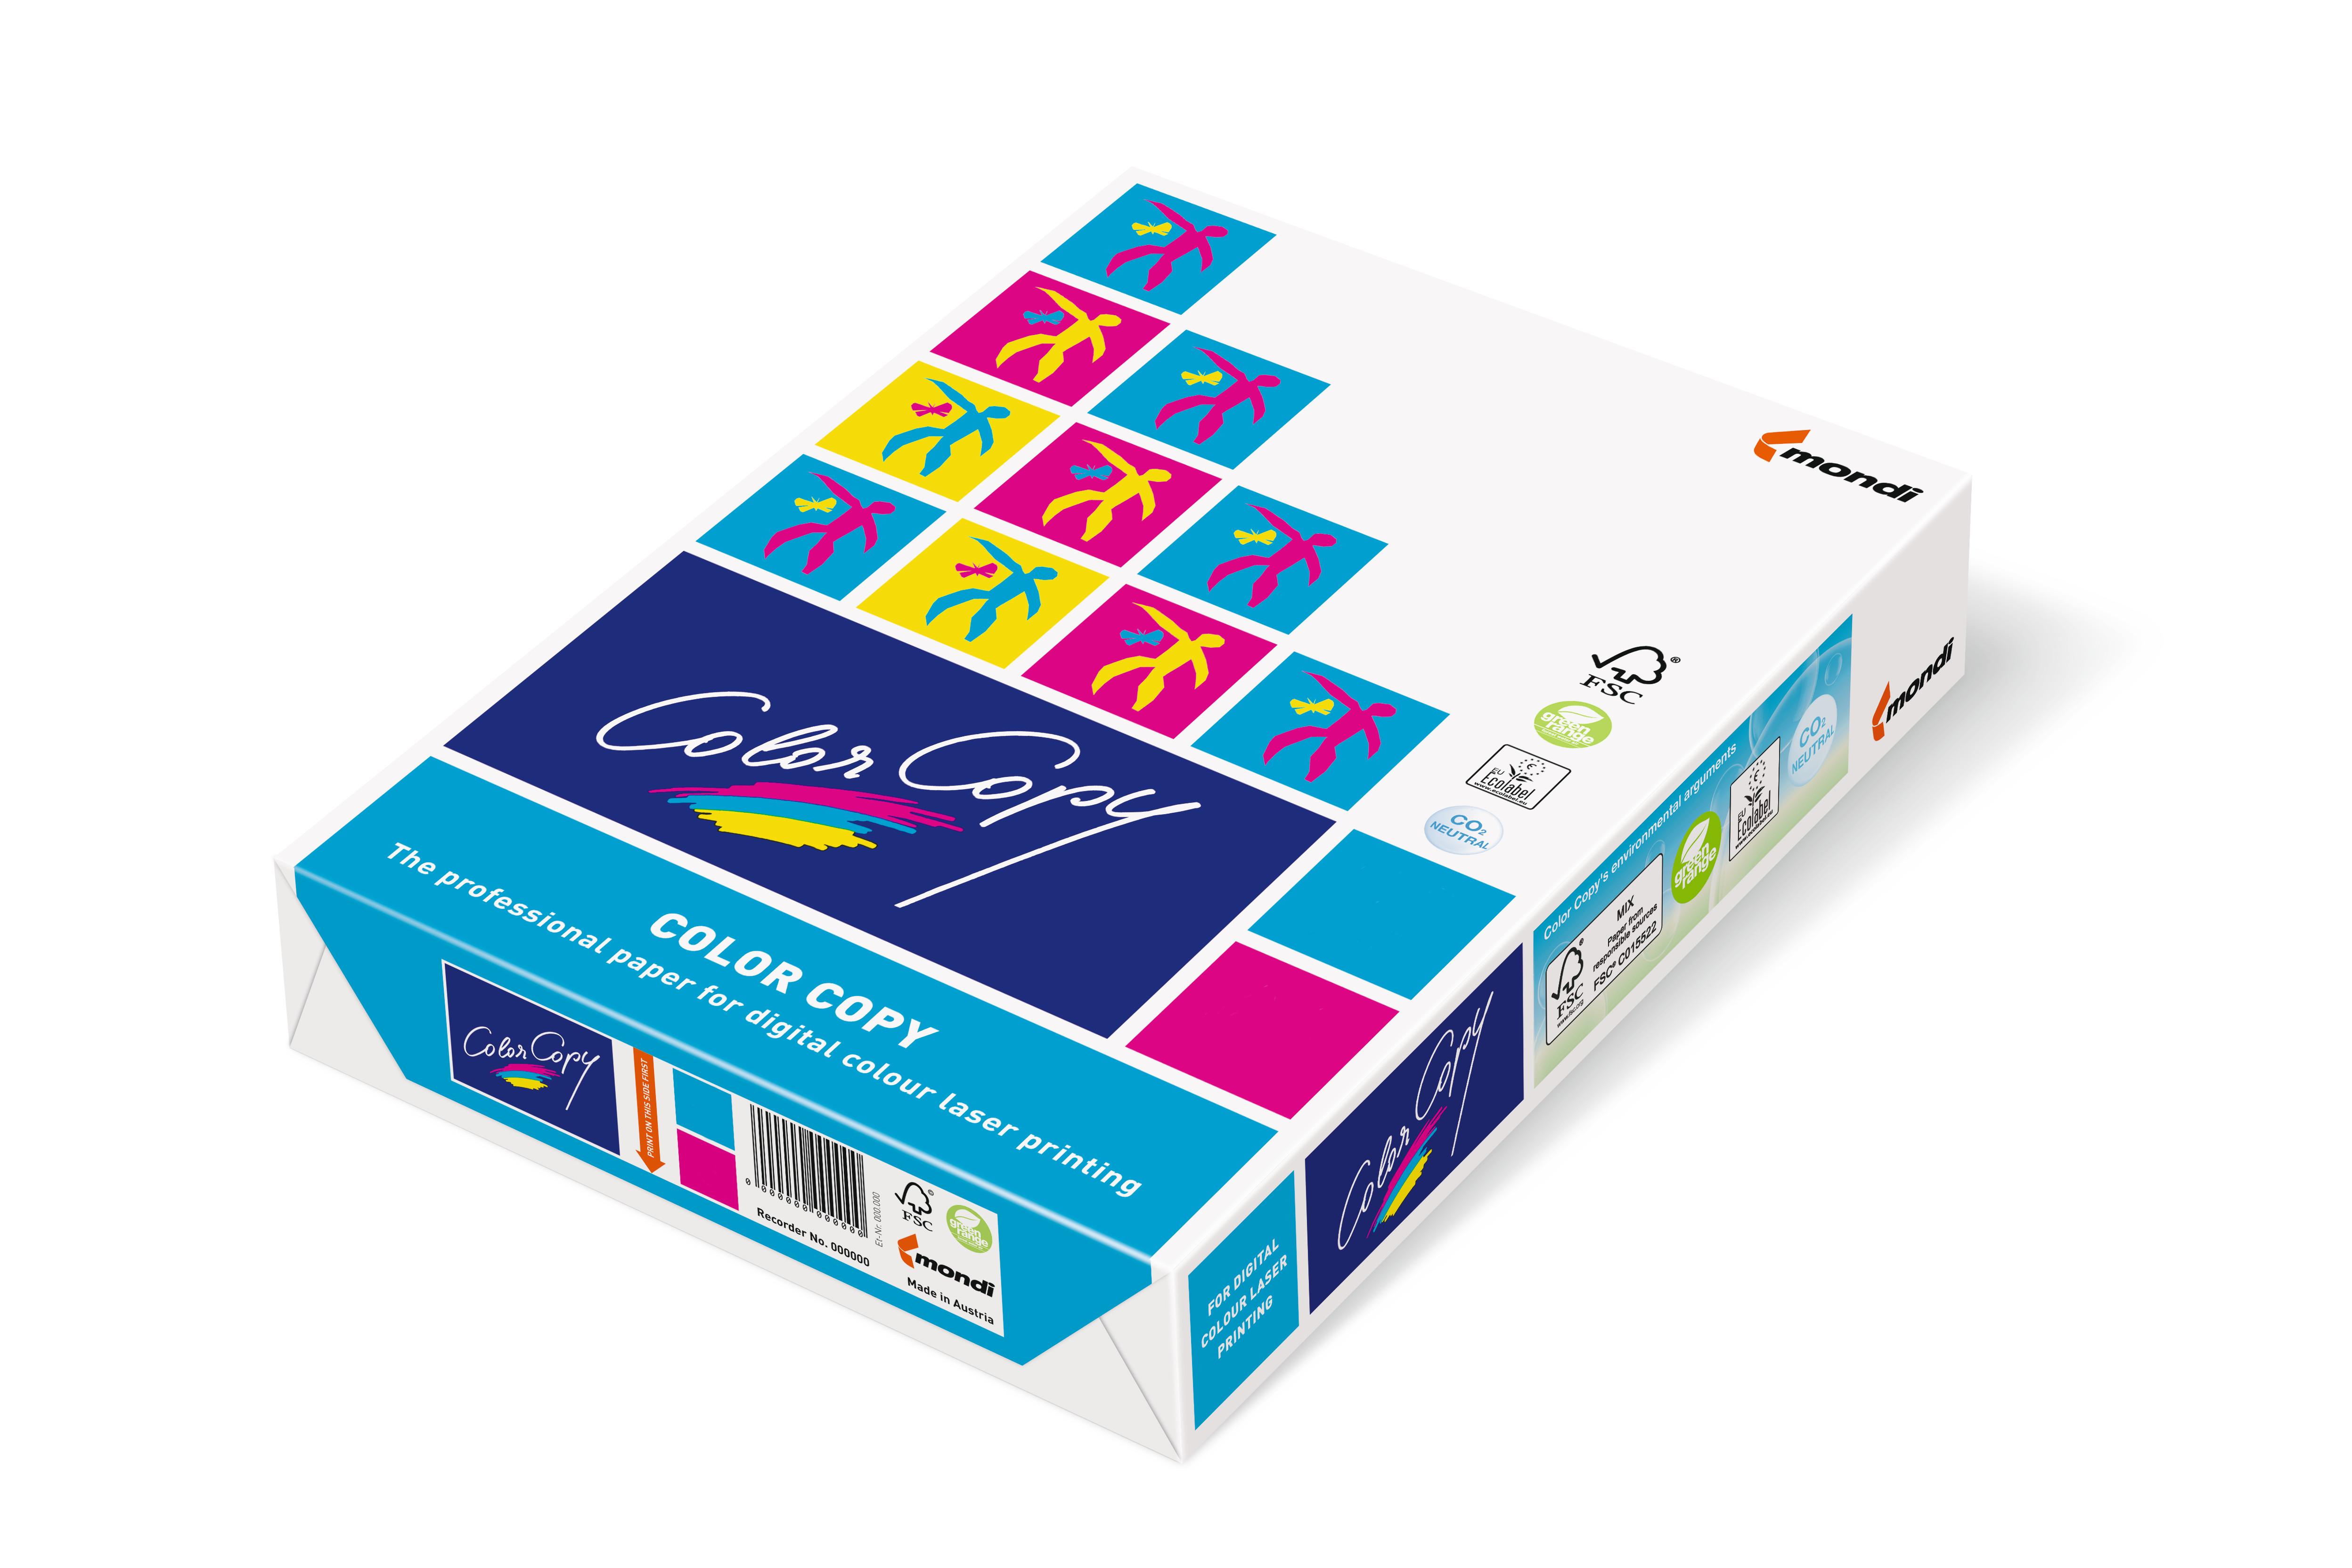 Vorschau: Mondi Color Copy 220 g/m² DIN-A3 250 Blatt